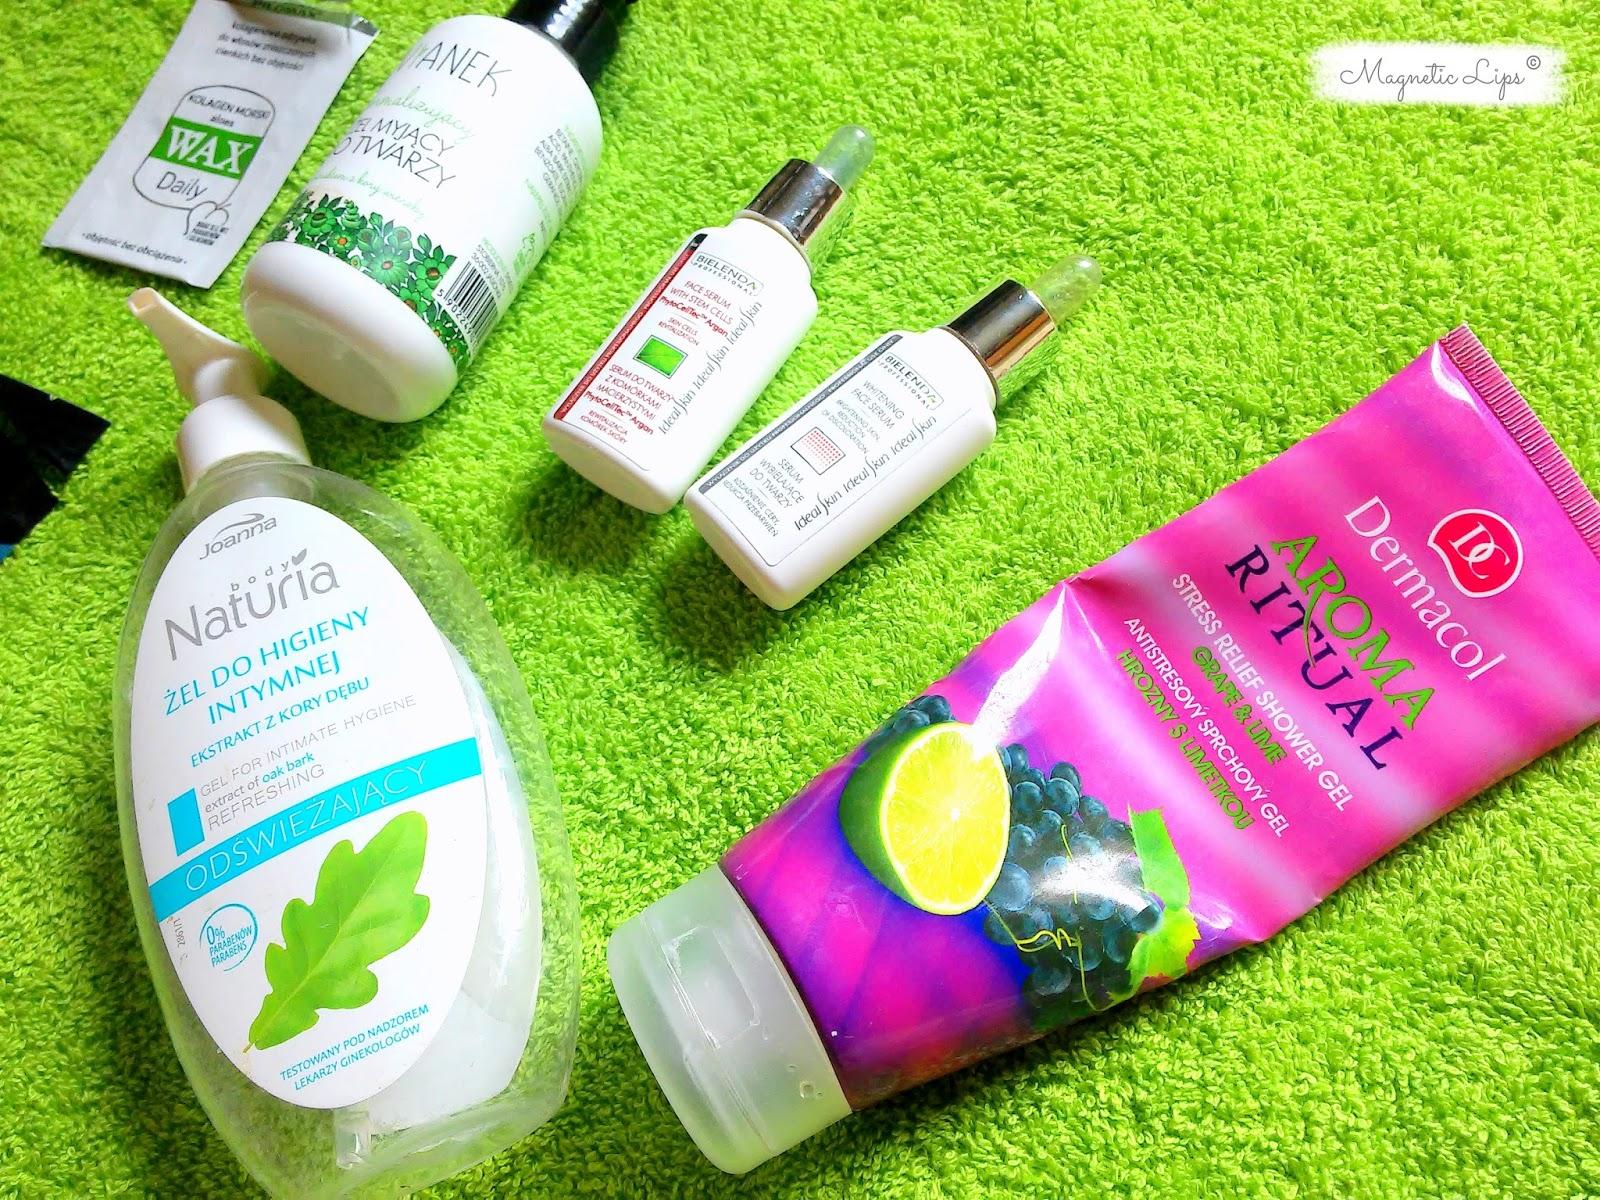 kosmetyki naturalne blog naturaorganika